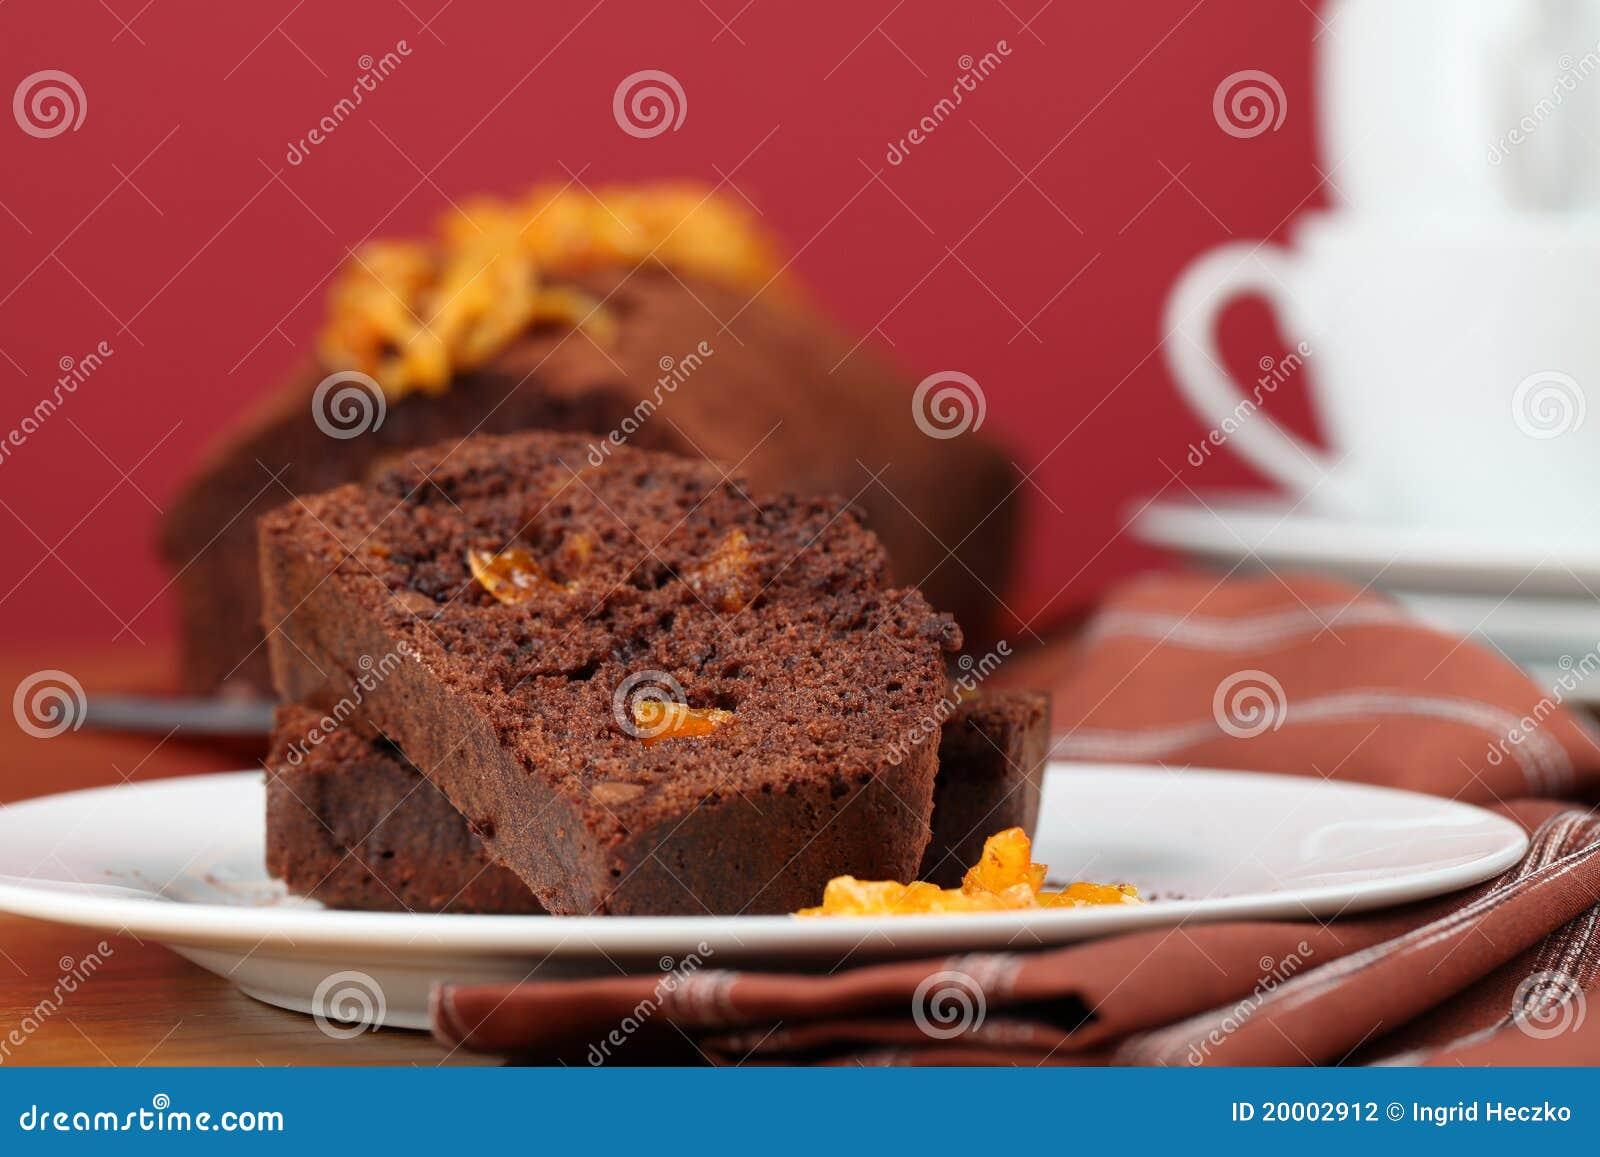 Ingredient Chocolate Cake Tasty